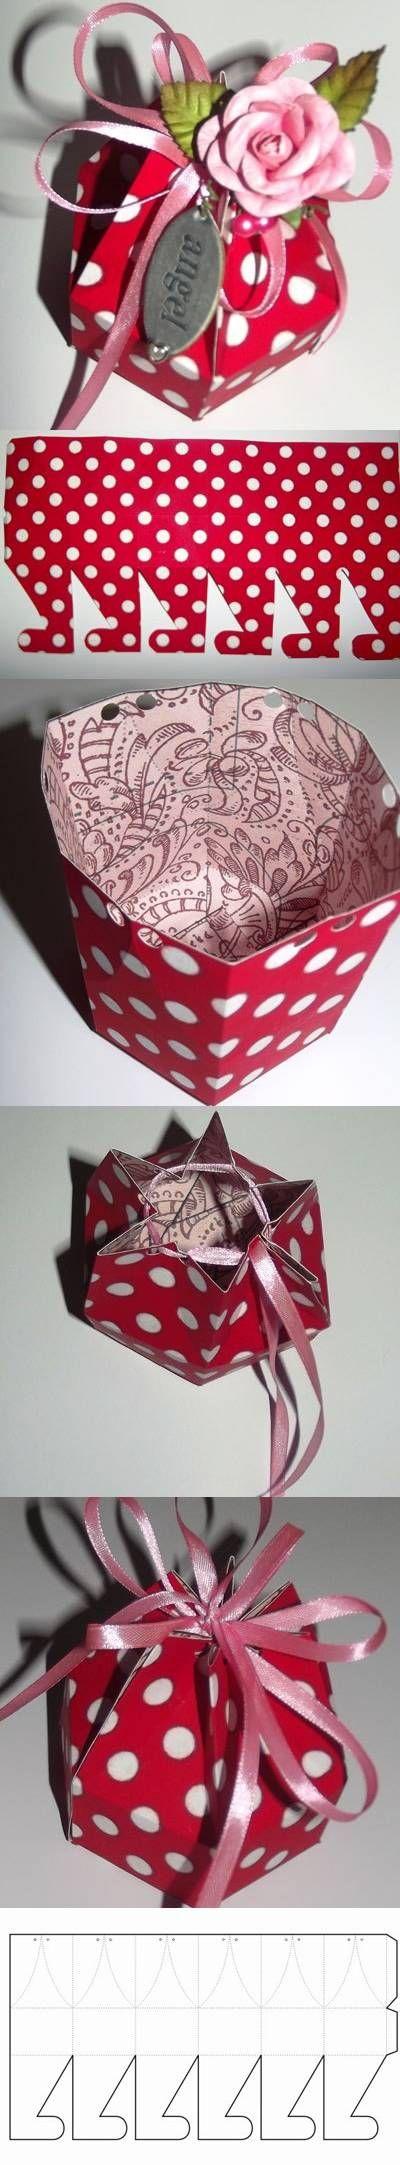 DIY Hexagonal Gift Box with Template